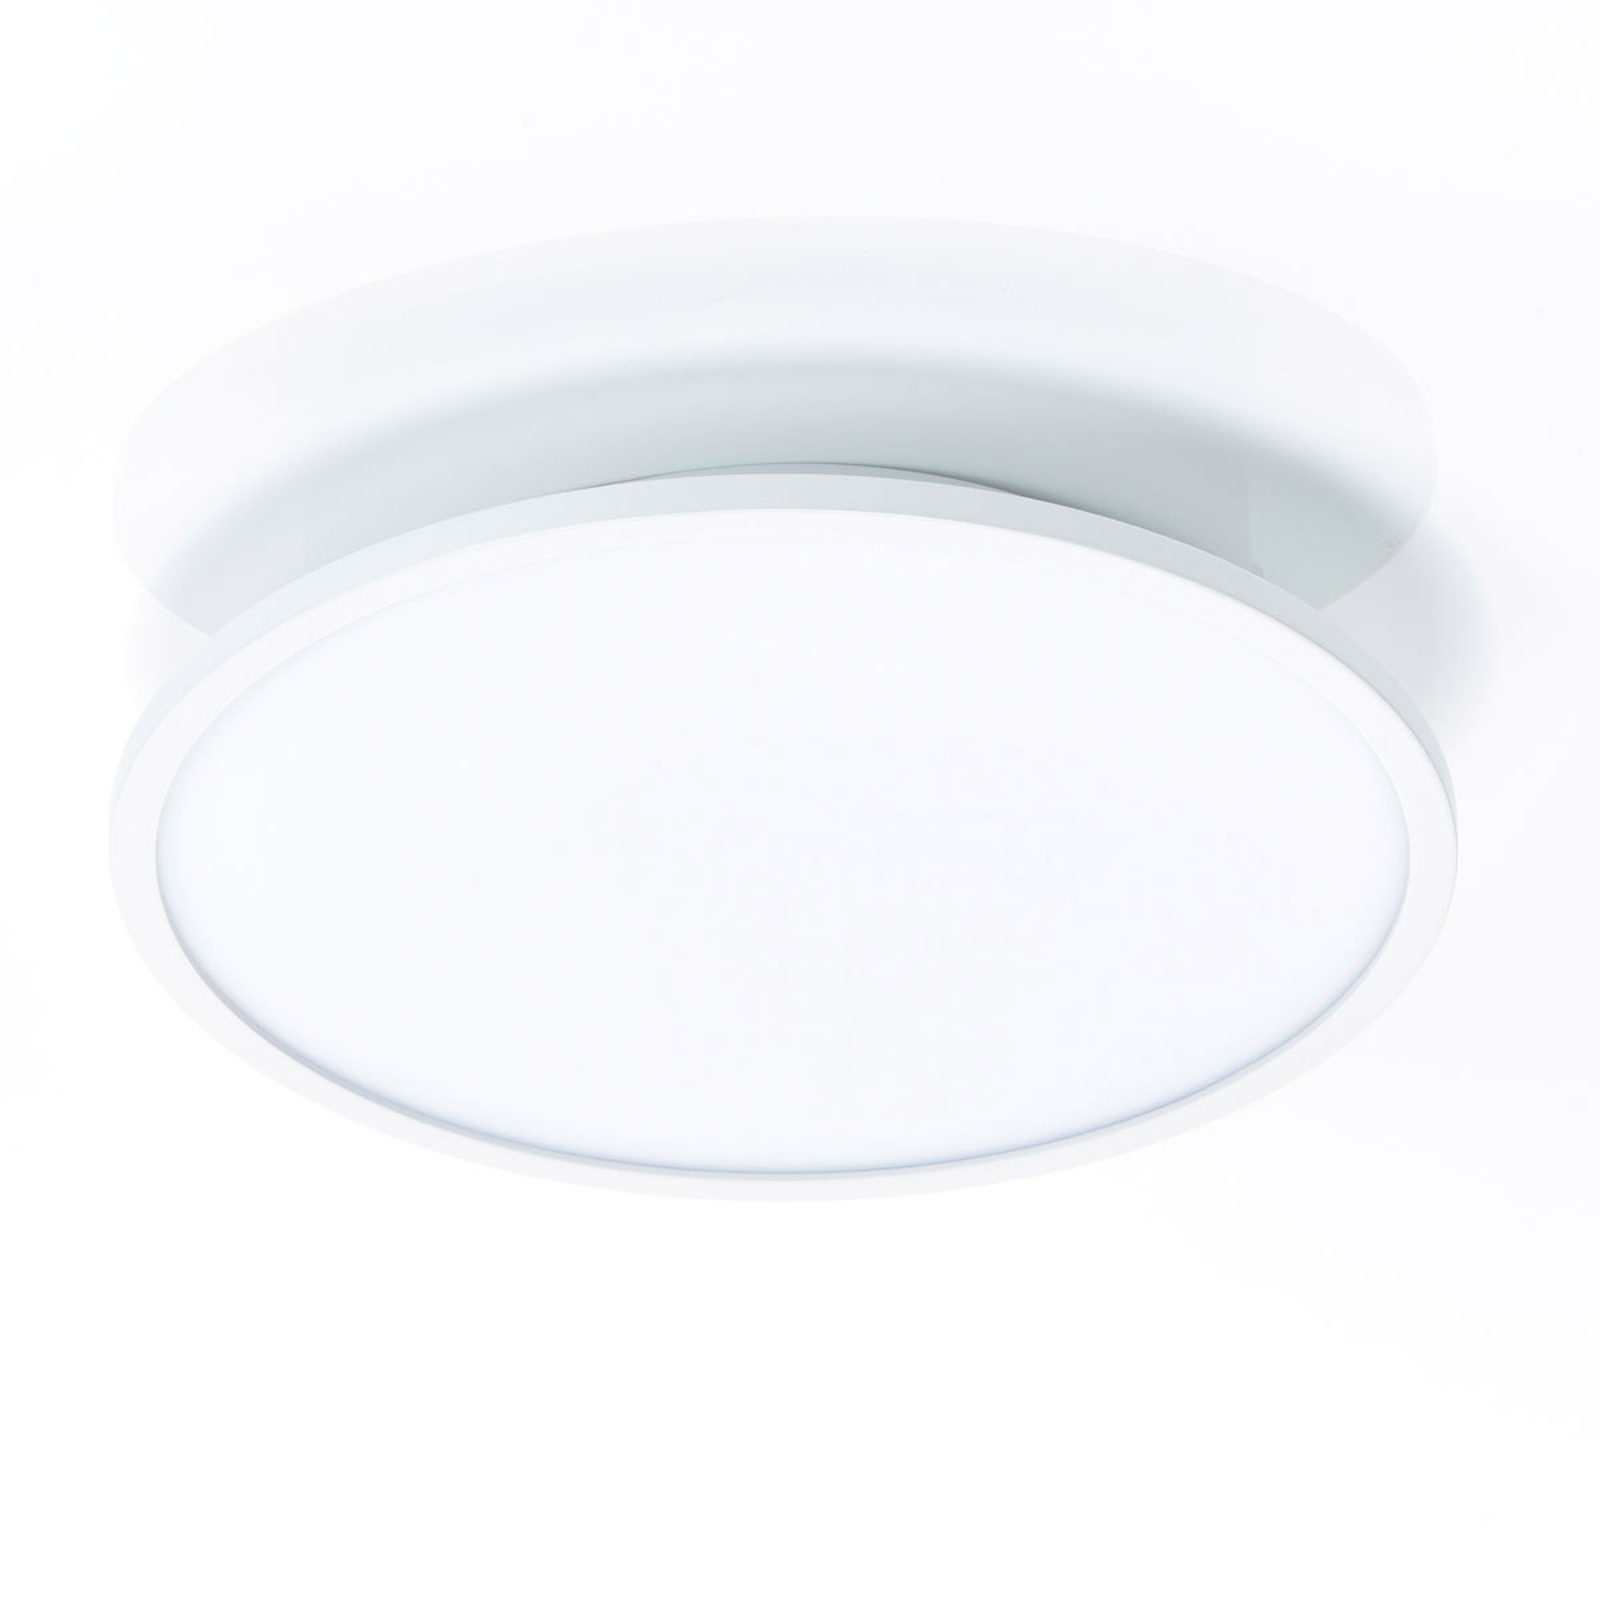 Ceres - LED plafondlamp met easydim functie